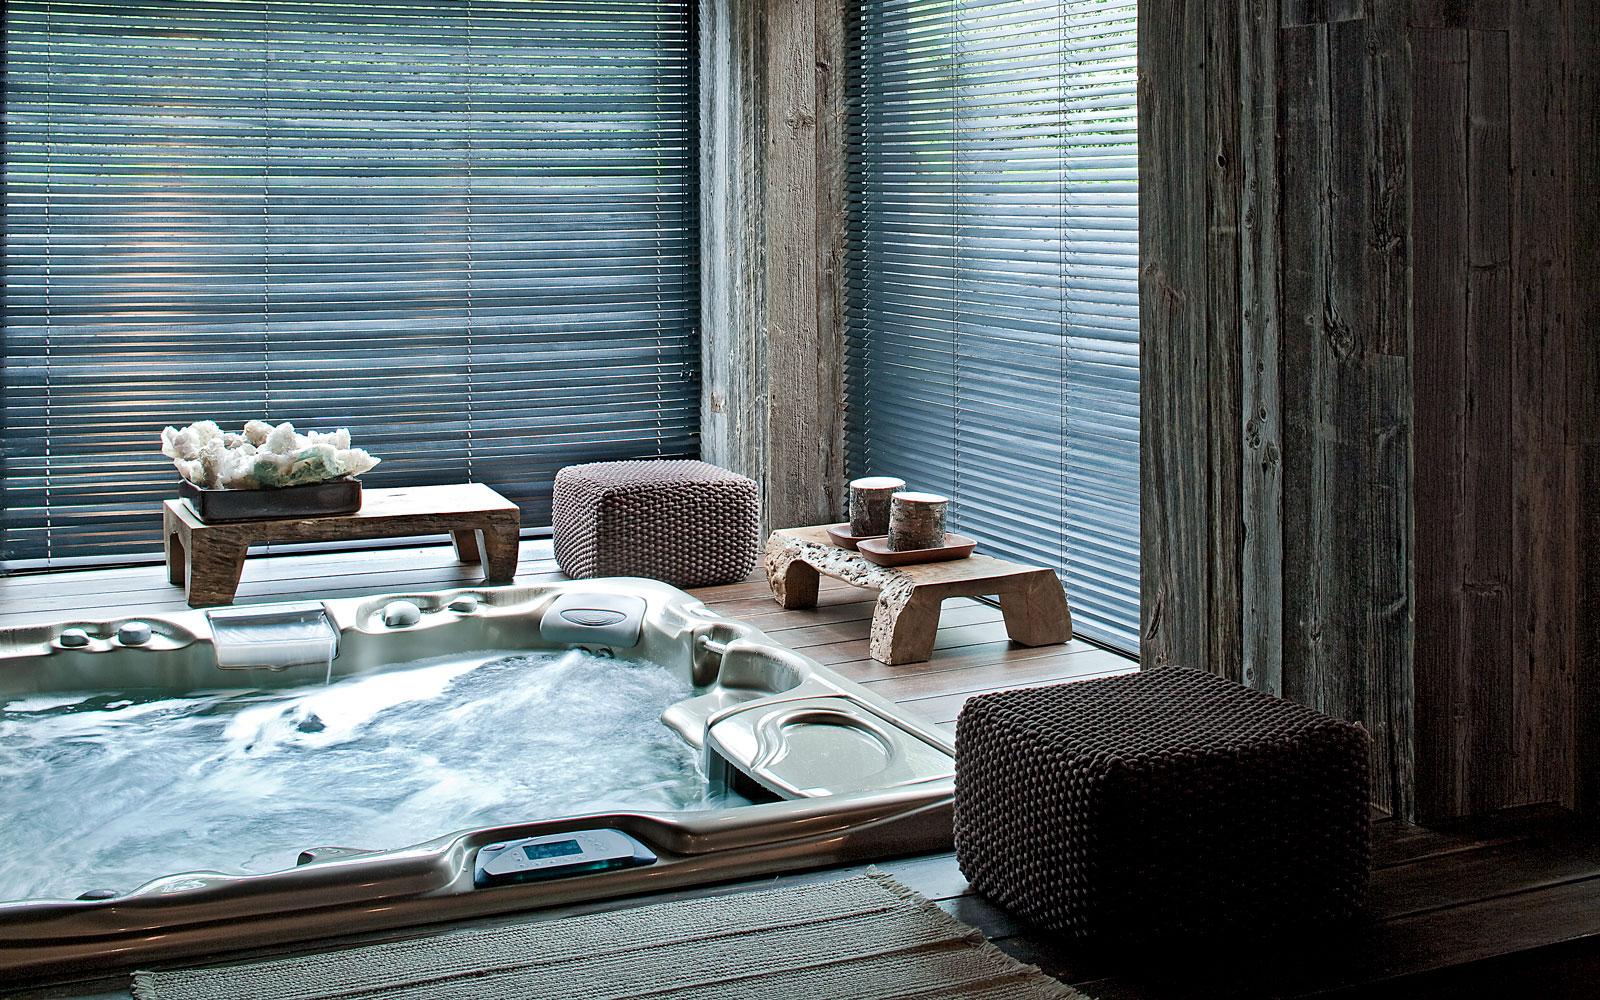 Wellness, souterrain, jacuzzi, ontspannen, bubbelbad, riante villa, Leeflang Architectuur